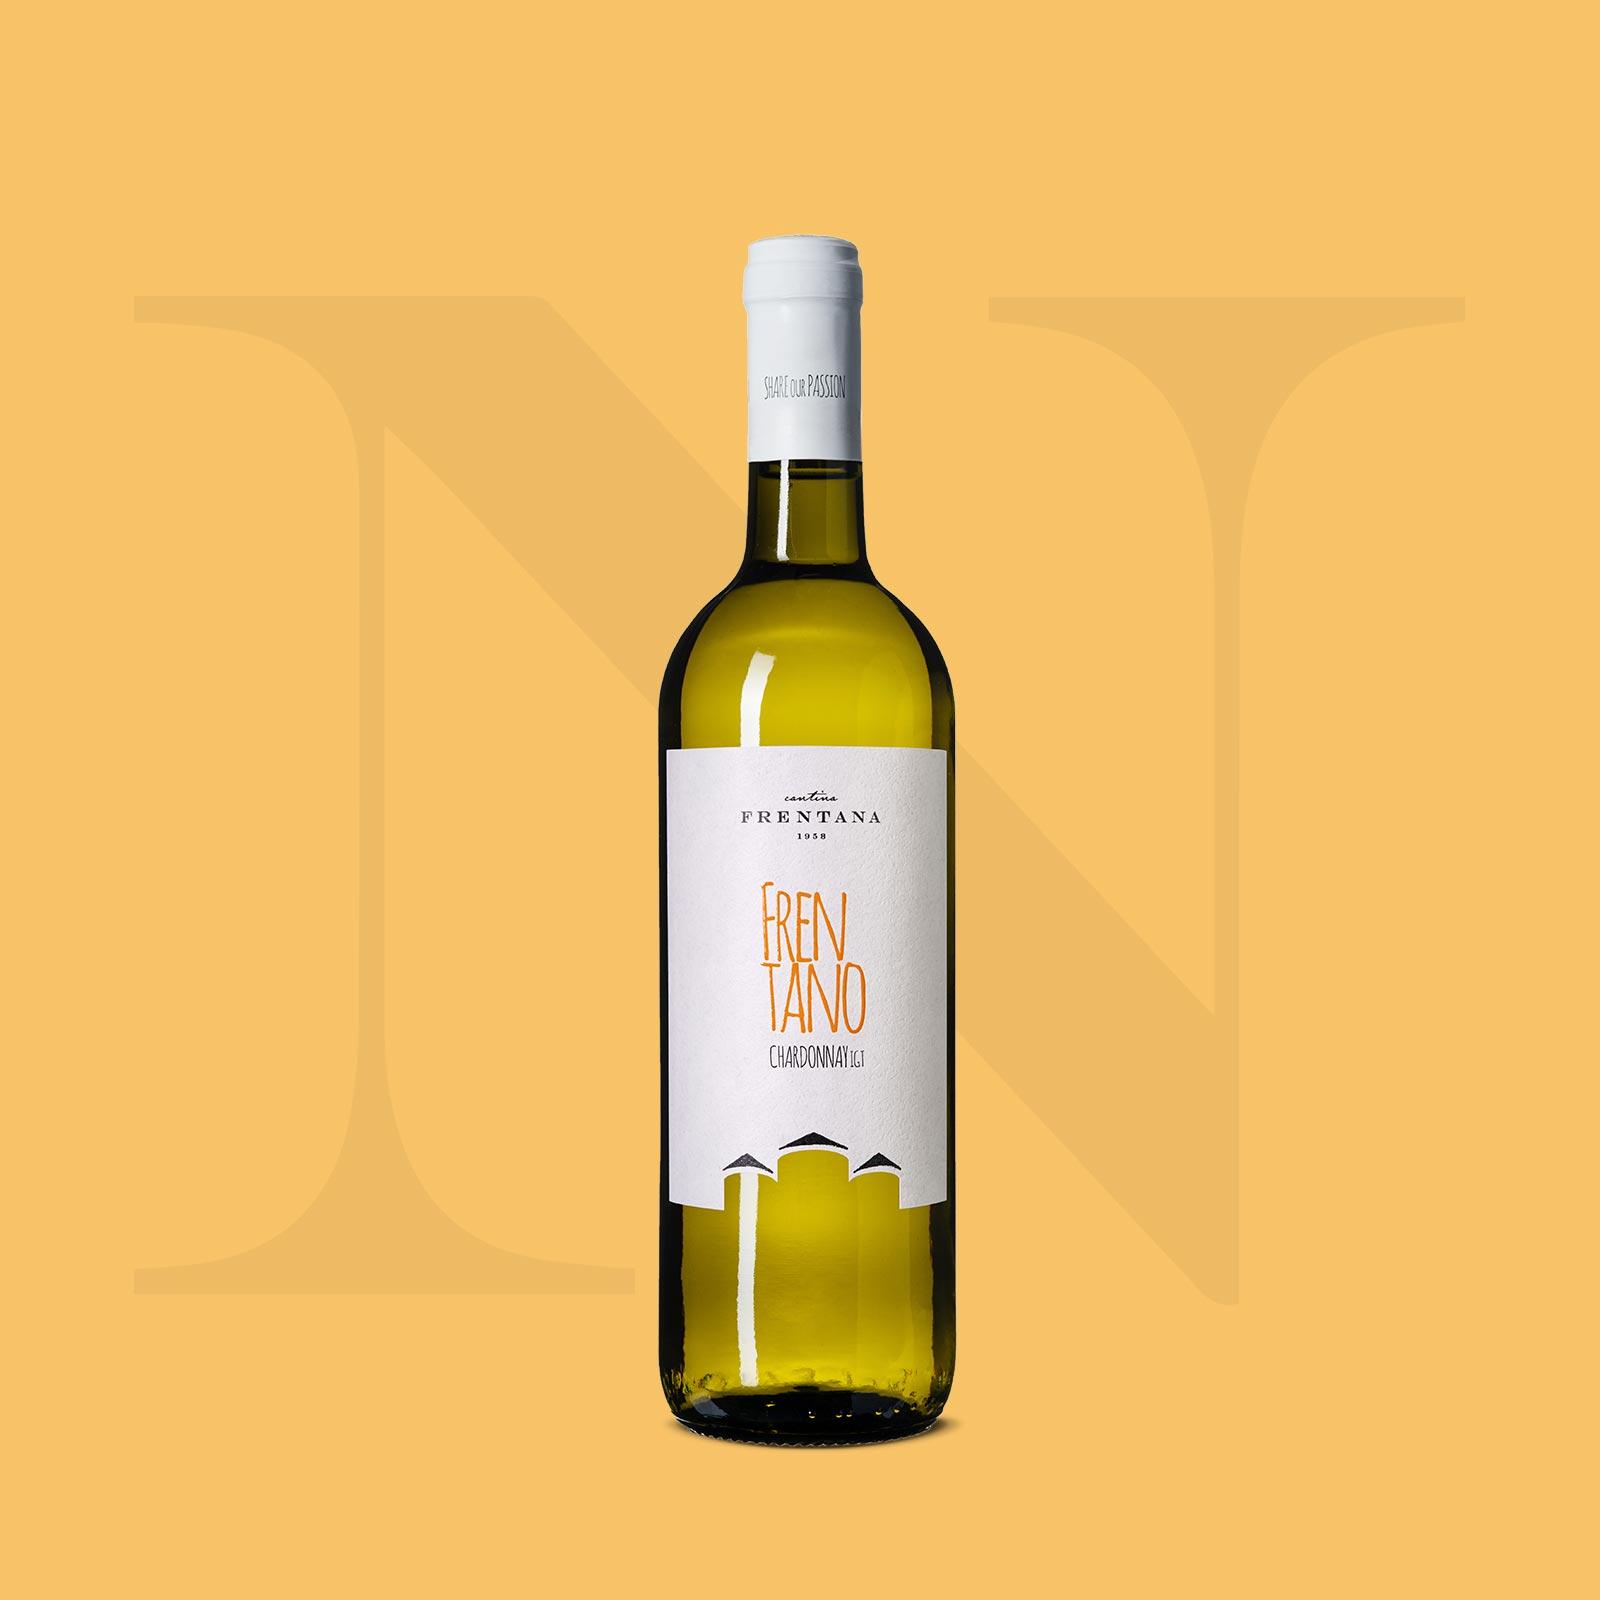 Frentano Chardonnay IGT - Cantina Frentana